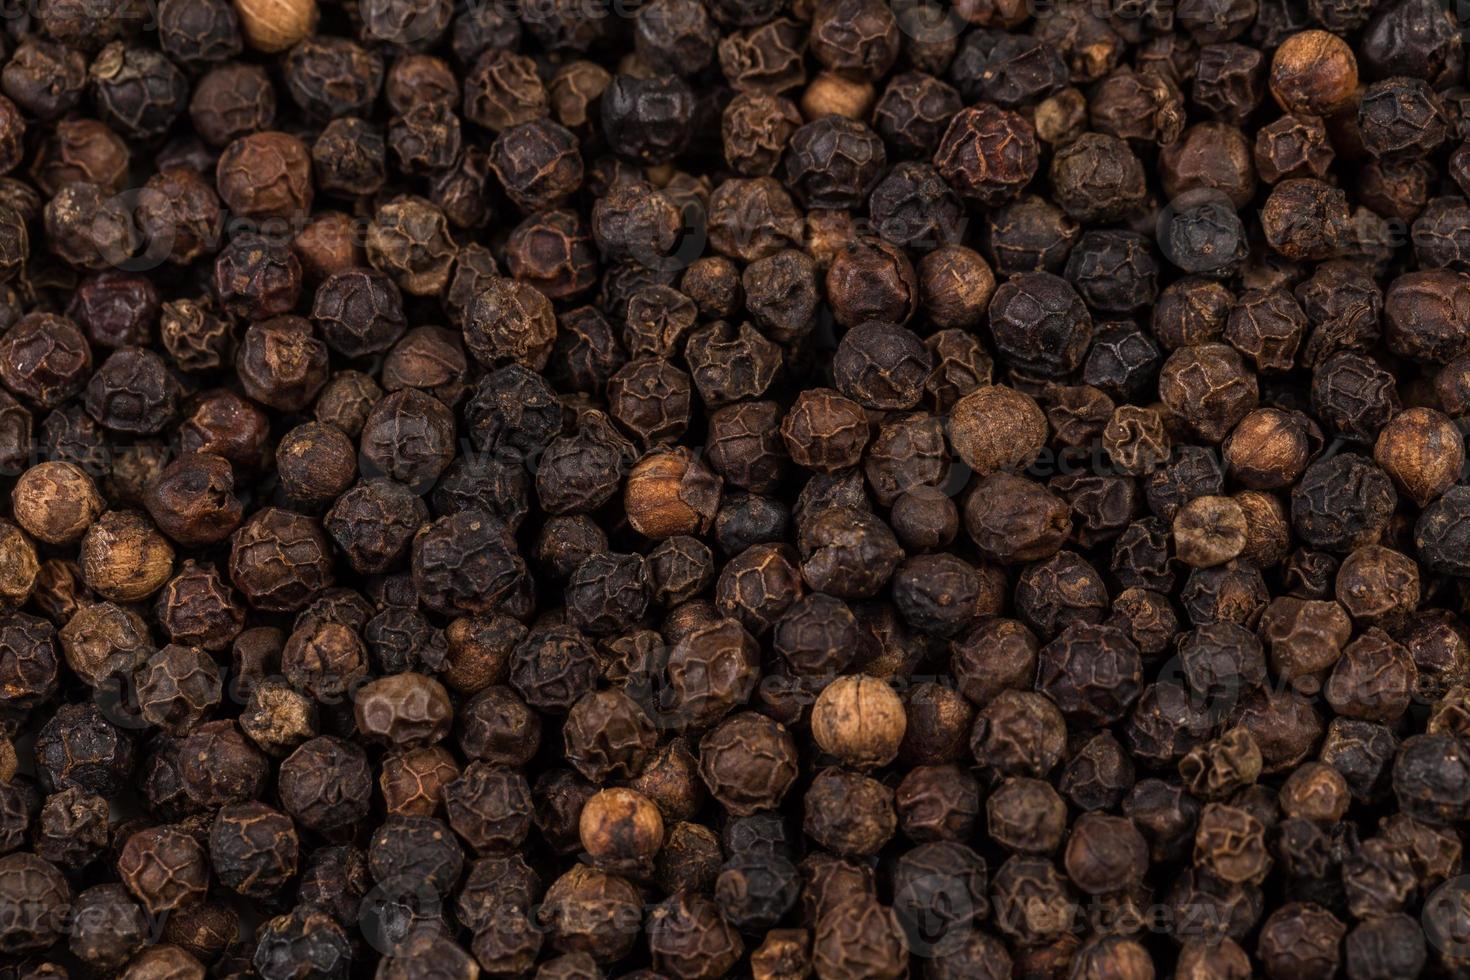 zwarte peper zoomde in foto